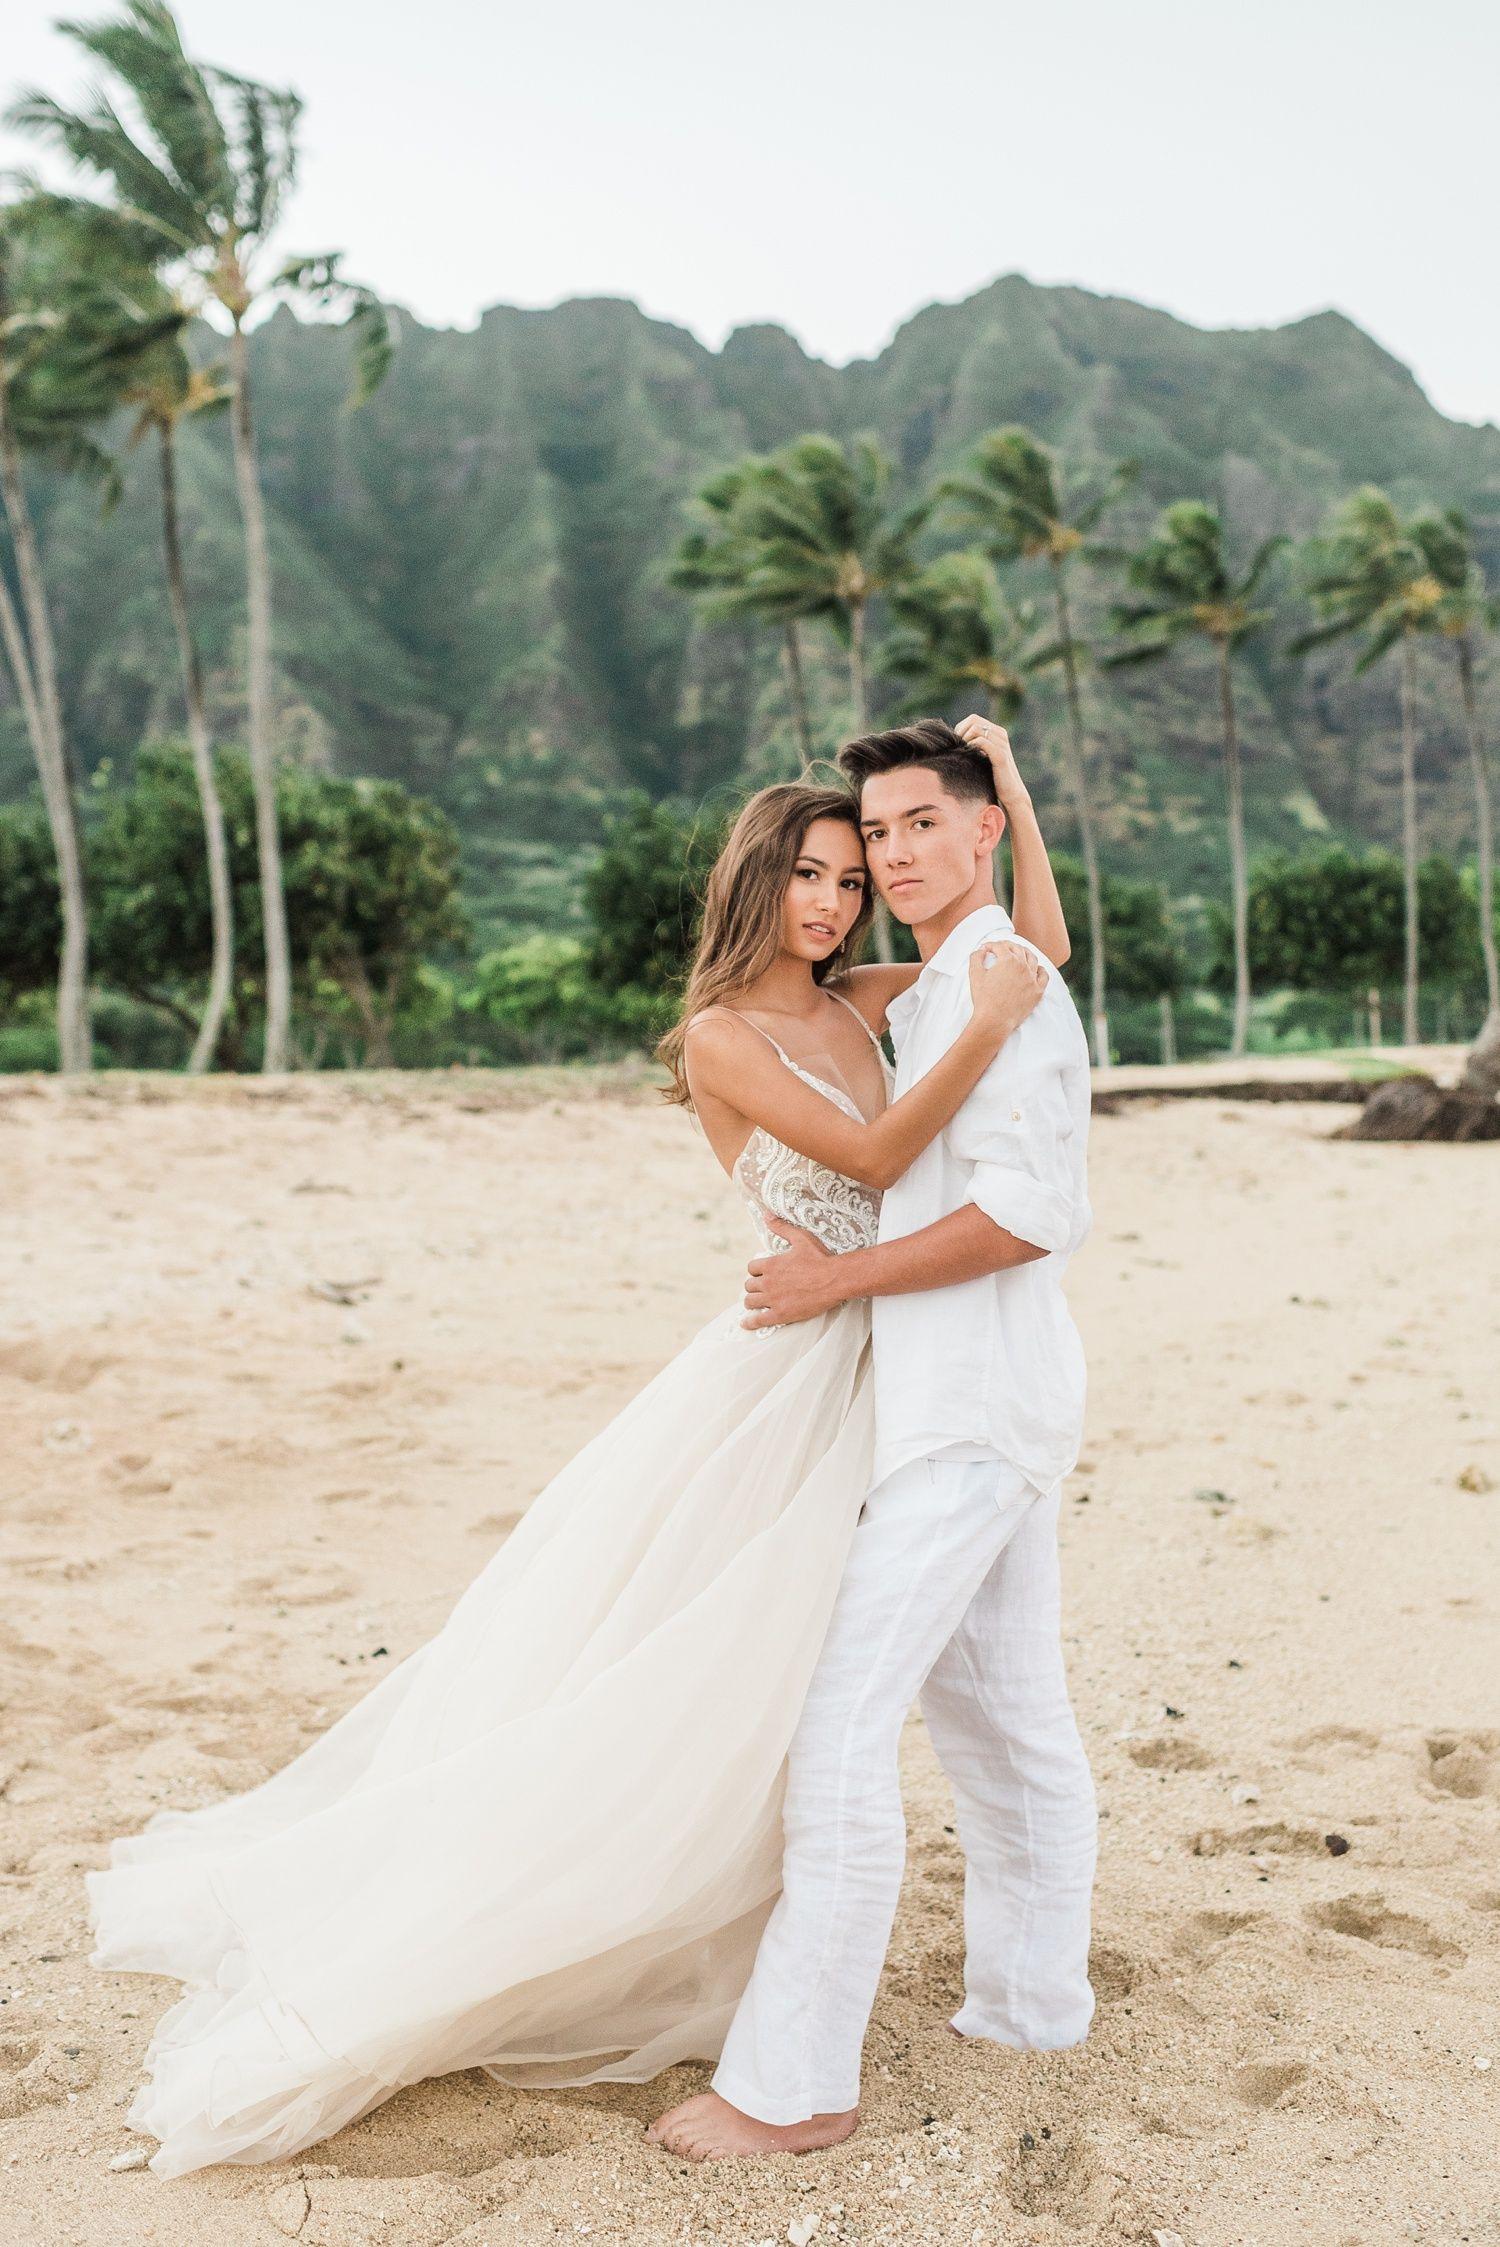 Tropical glamorous couple eloping in Hawaii at Kualoa